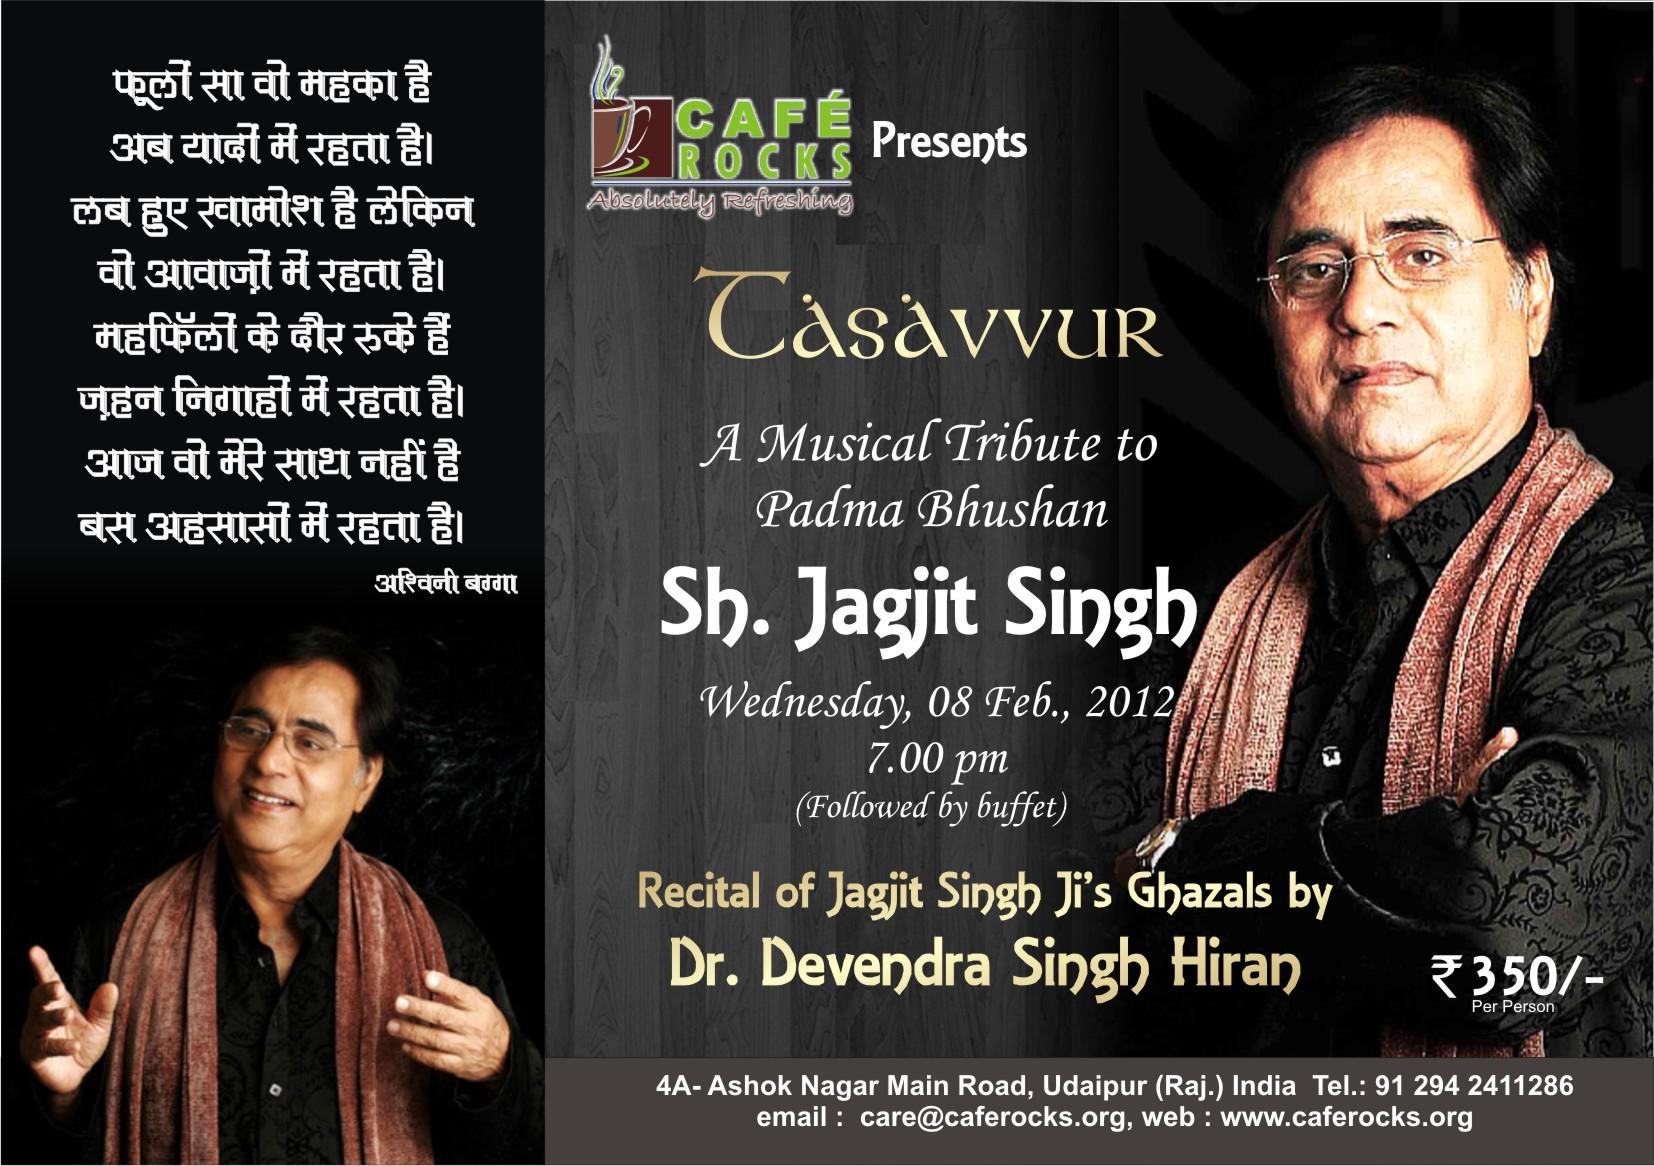 Tasavvur: A Musical Tribute to Jagjit Singh at Cafe Rocks